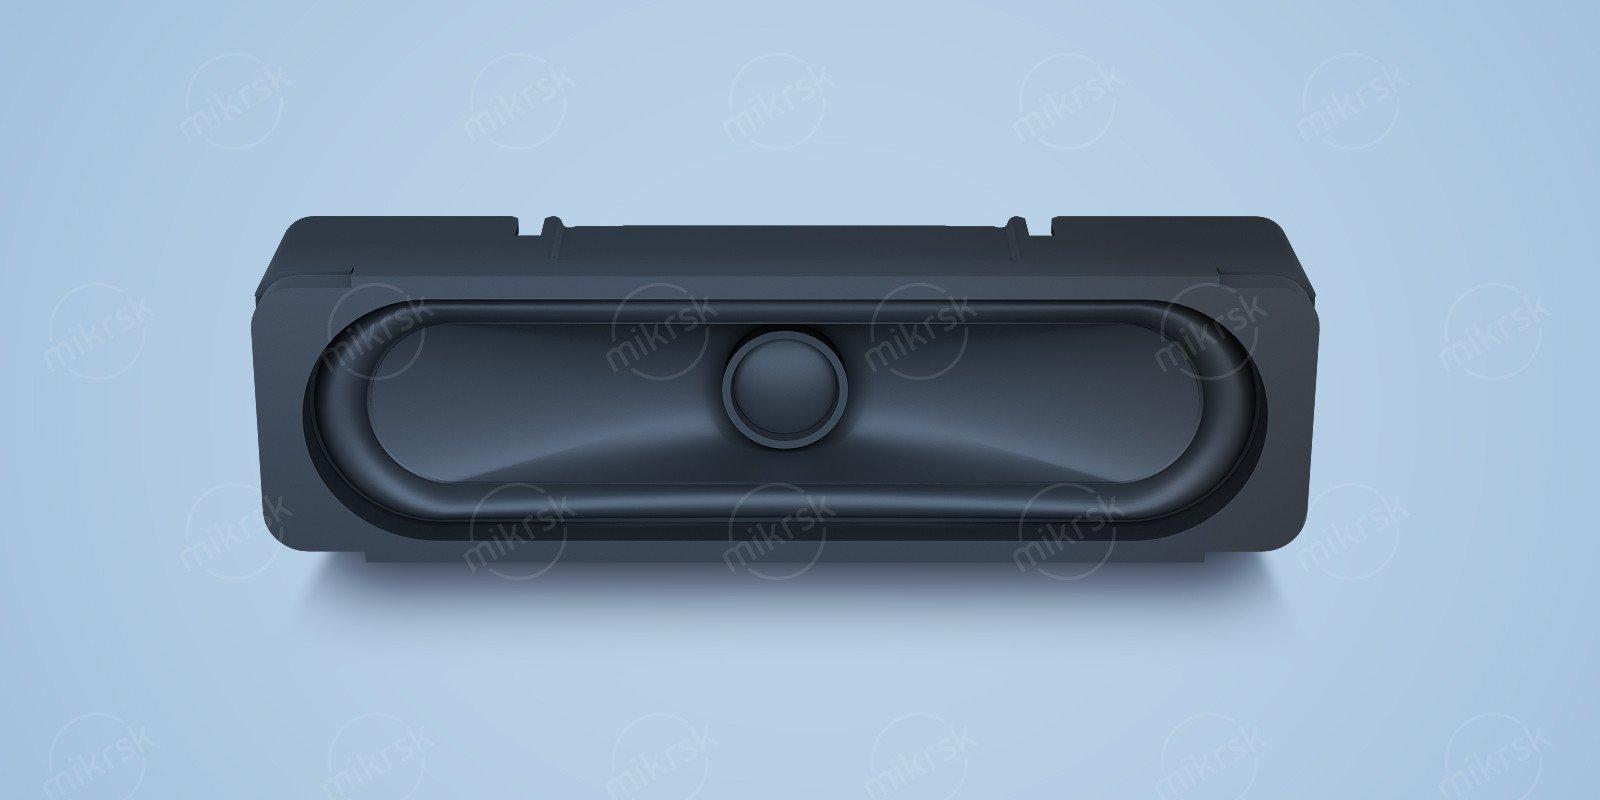 Телевизор Xiaomi Mi LED TV 4A 2GB + 8GB (EAC, 43 дюйма)